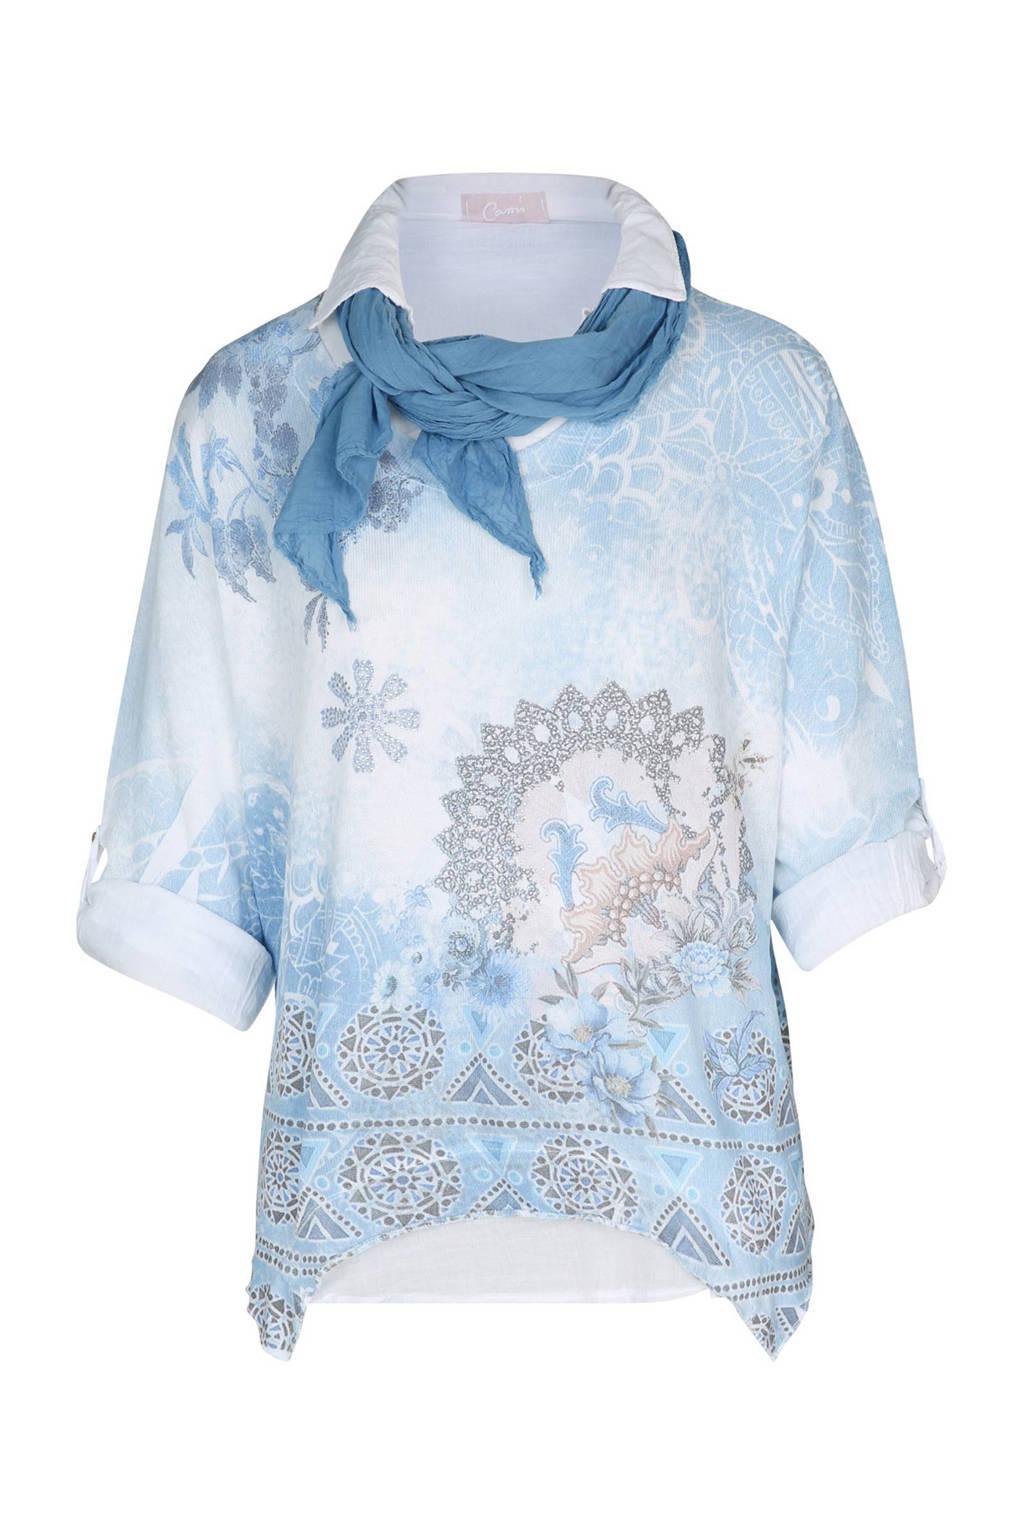 Cassis trui jersey met blouse detail, Blauw/wit